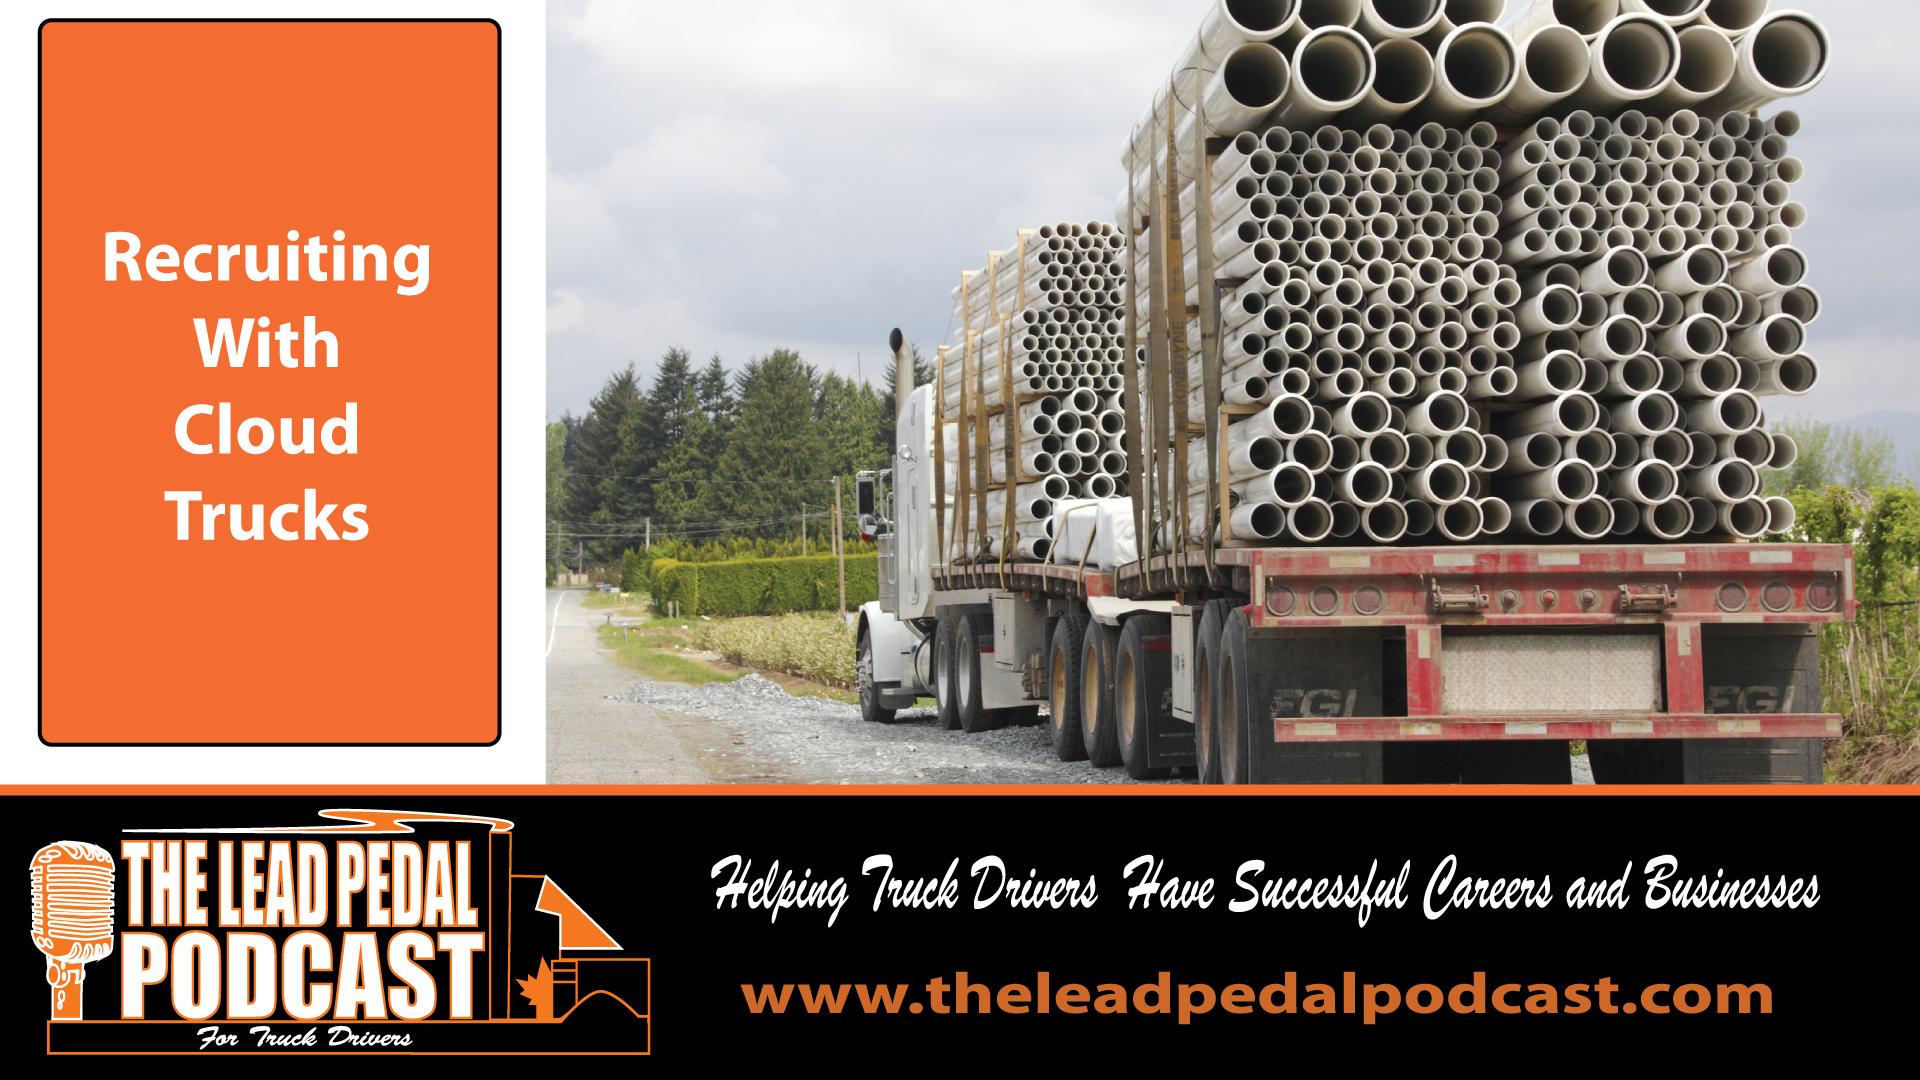 LP684 Recruiting Through Technology With Cloud Trucks